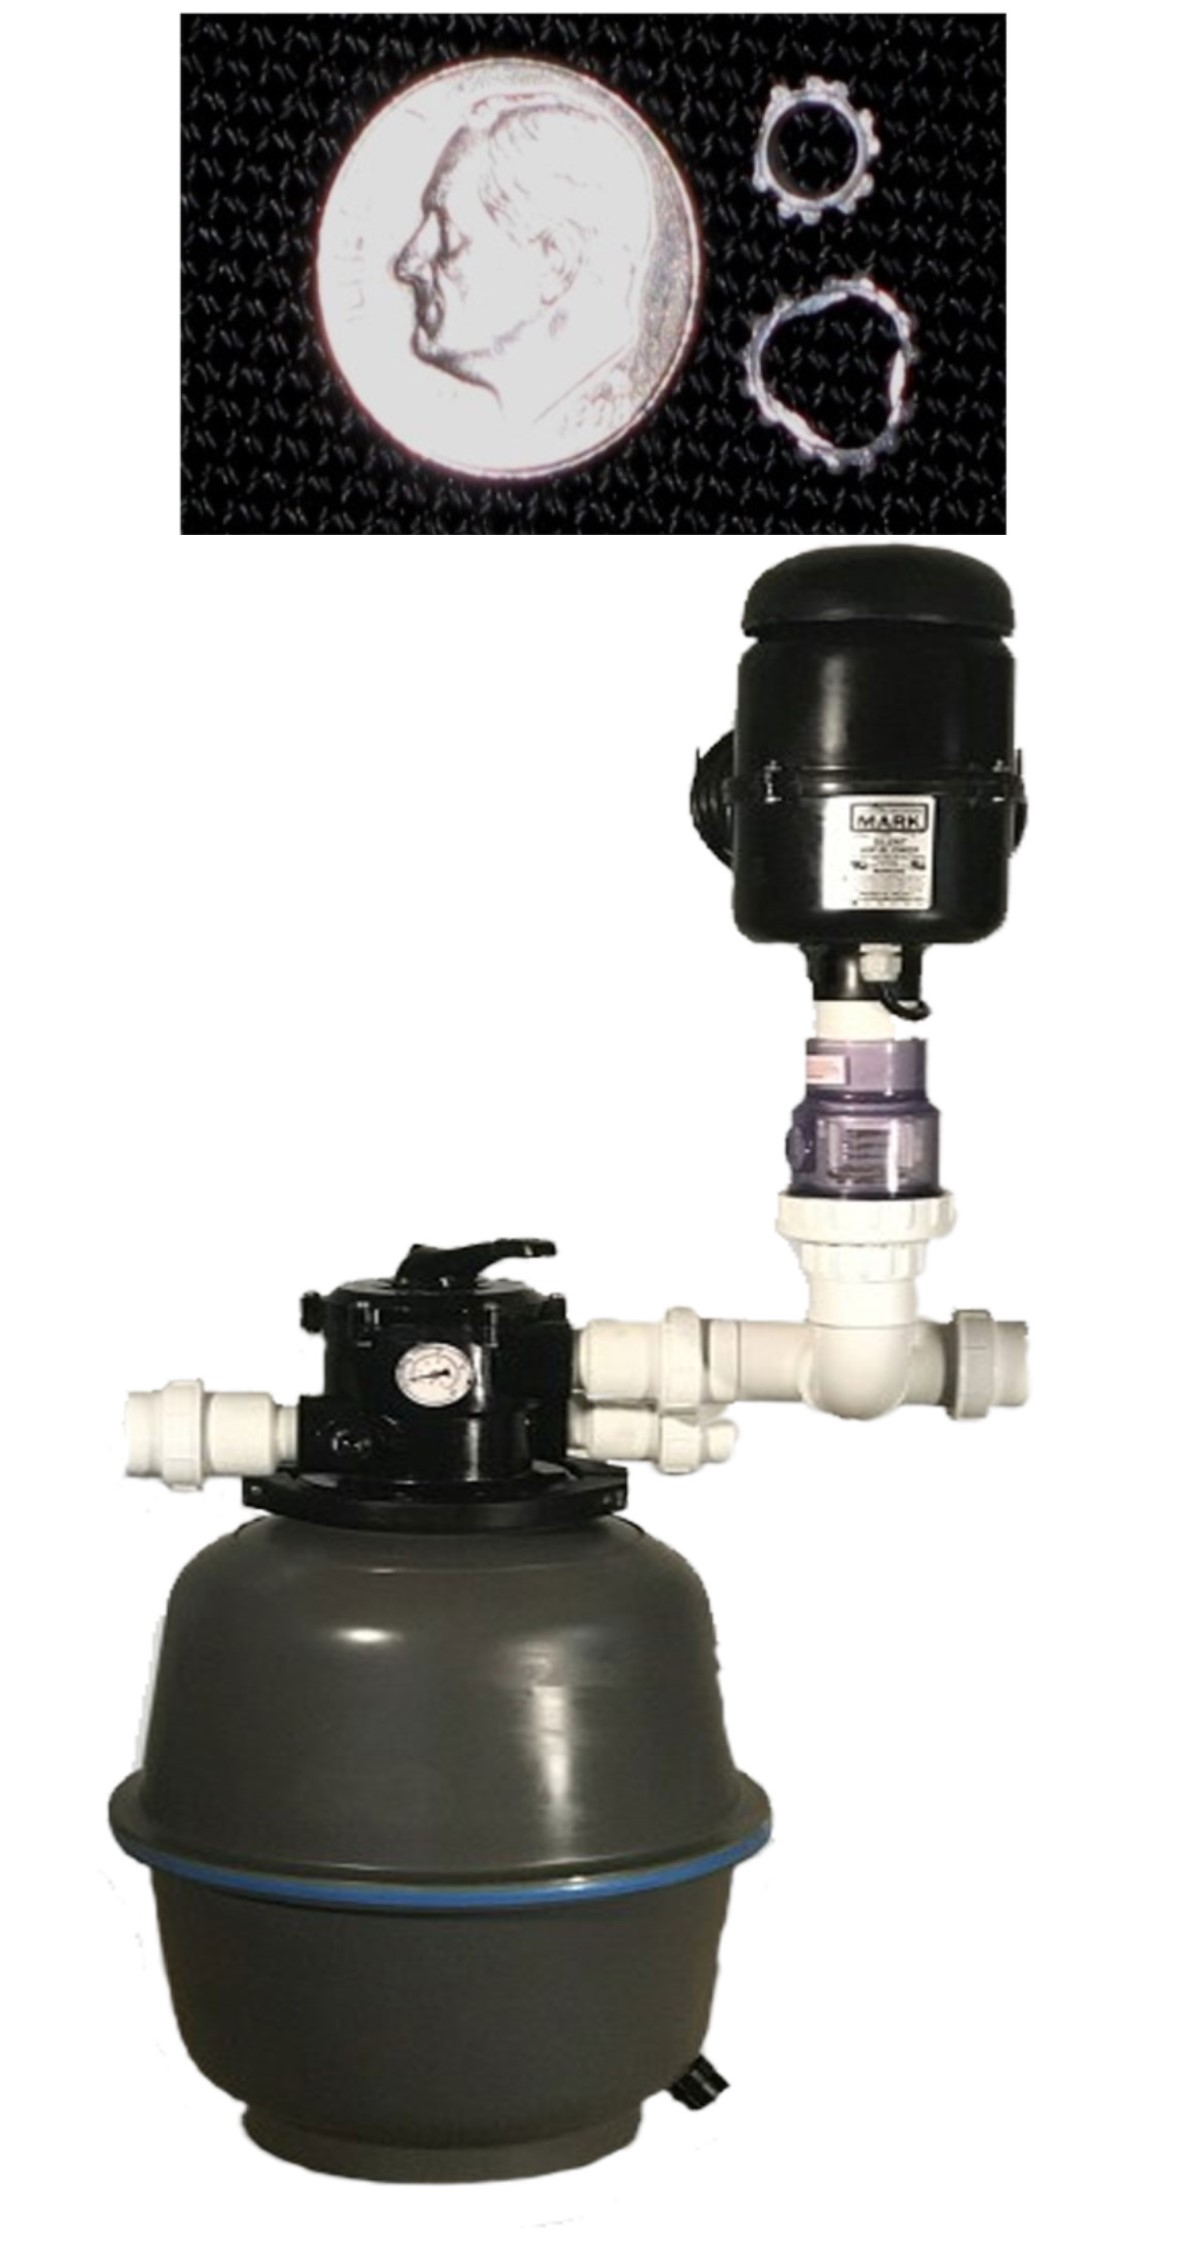 GCTek PondKeeper 1.25 Pond Filter